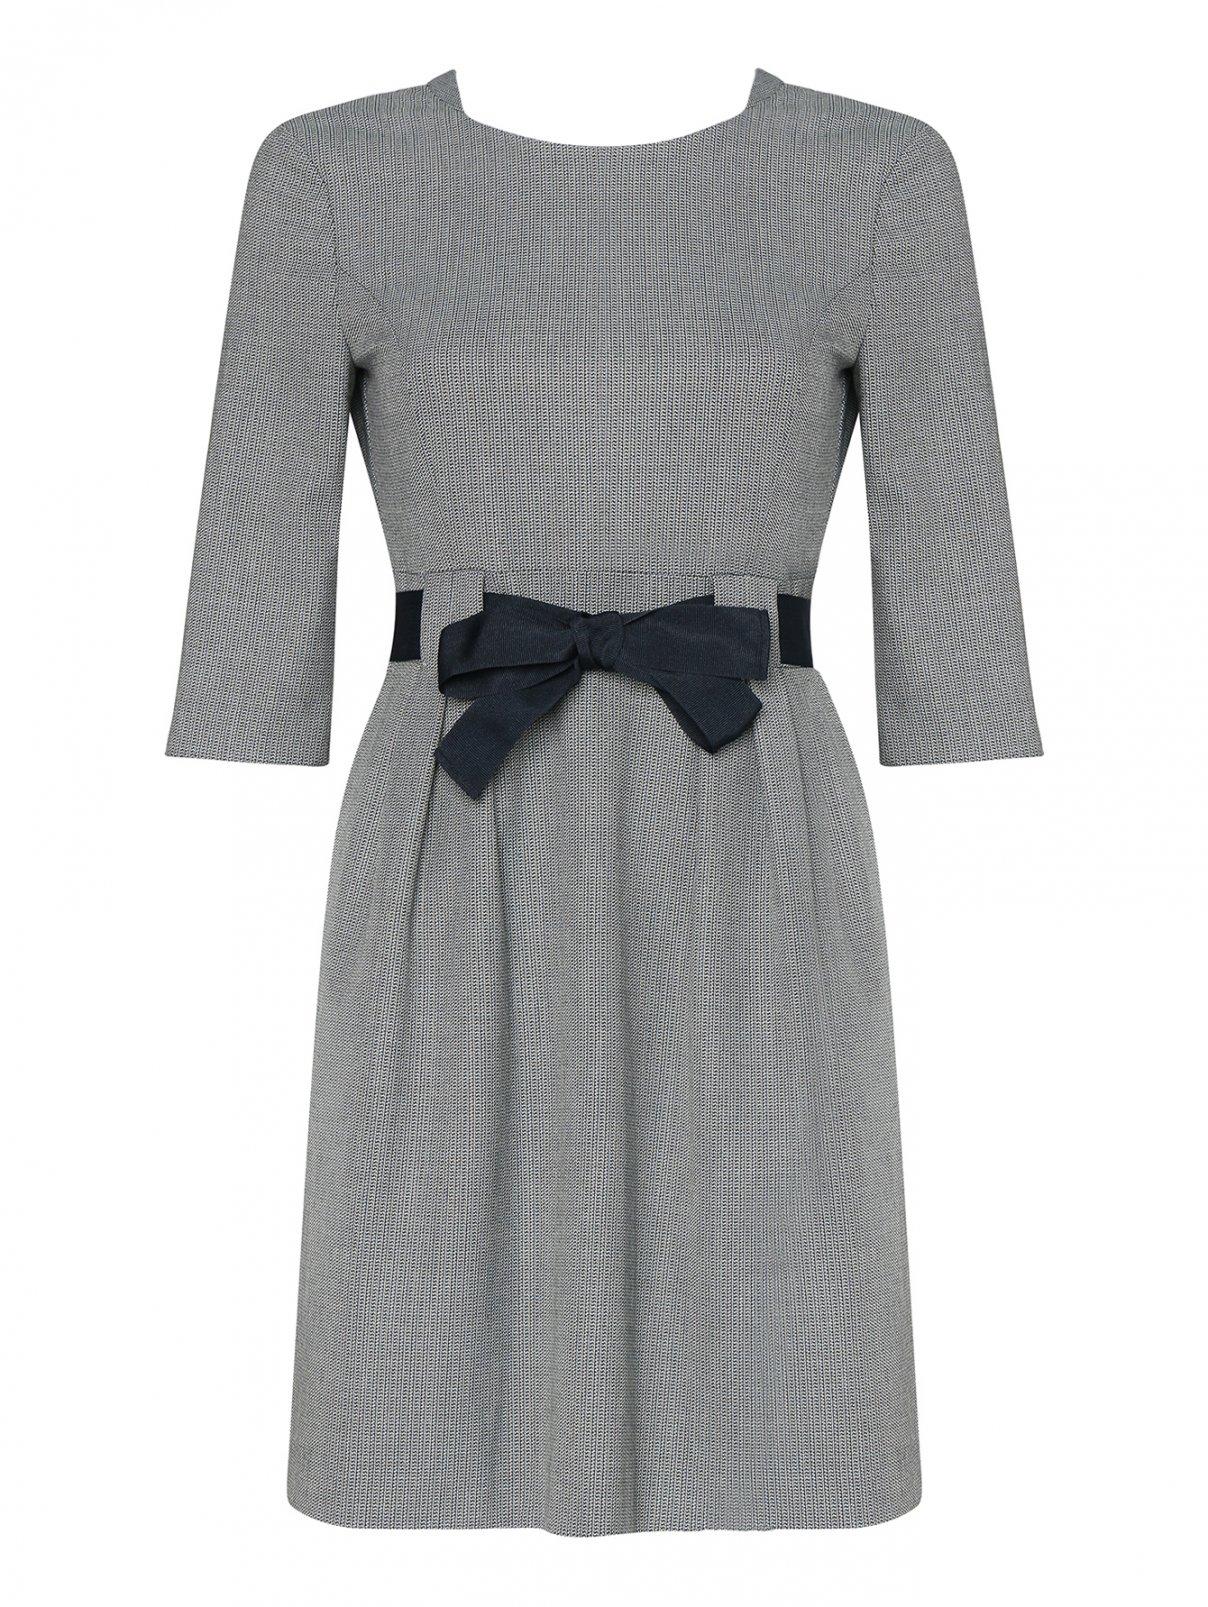 Платье-мини с рукавами 3/4 Max&Co  –  Общий вид